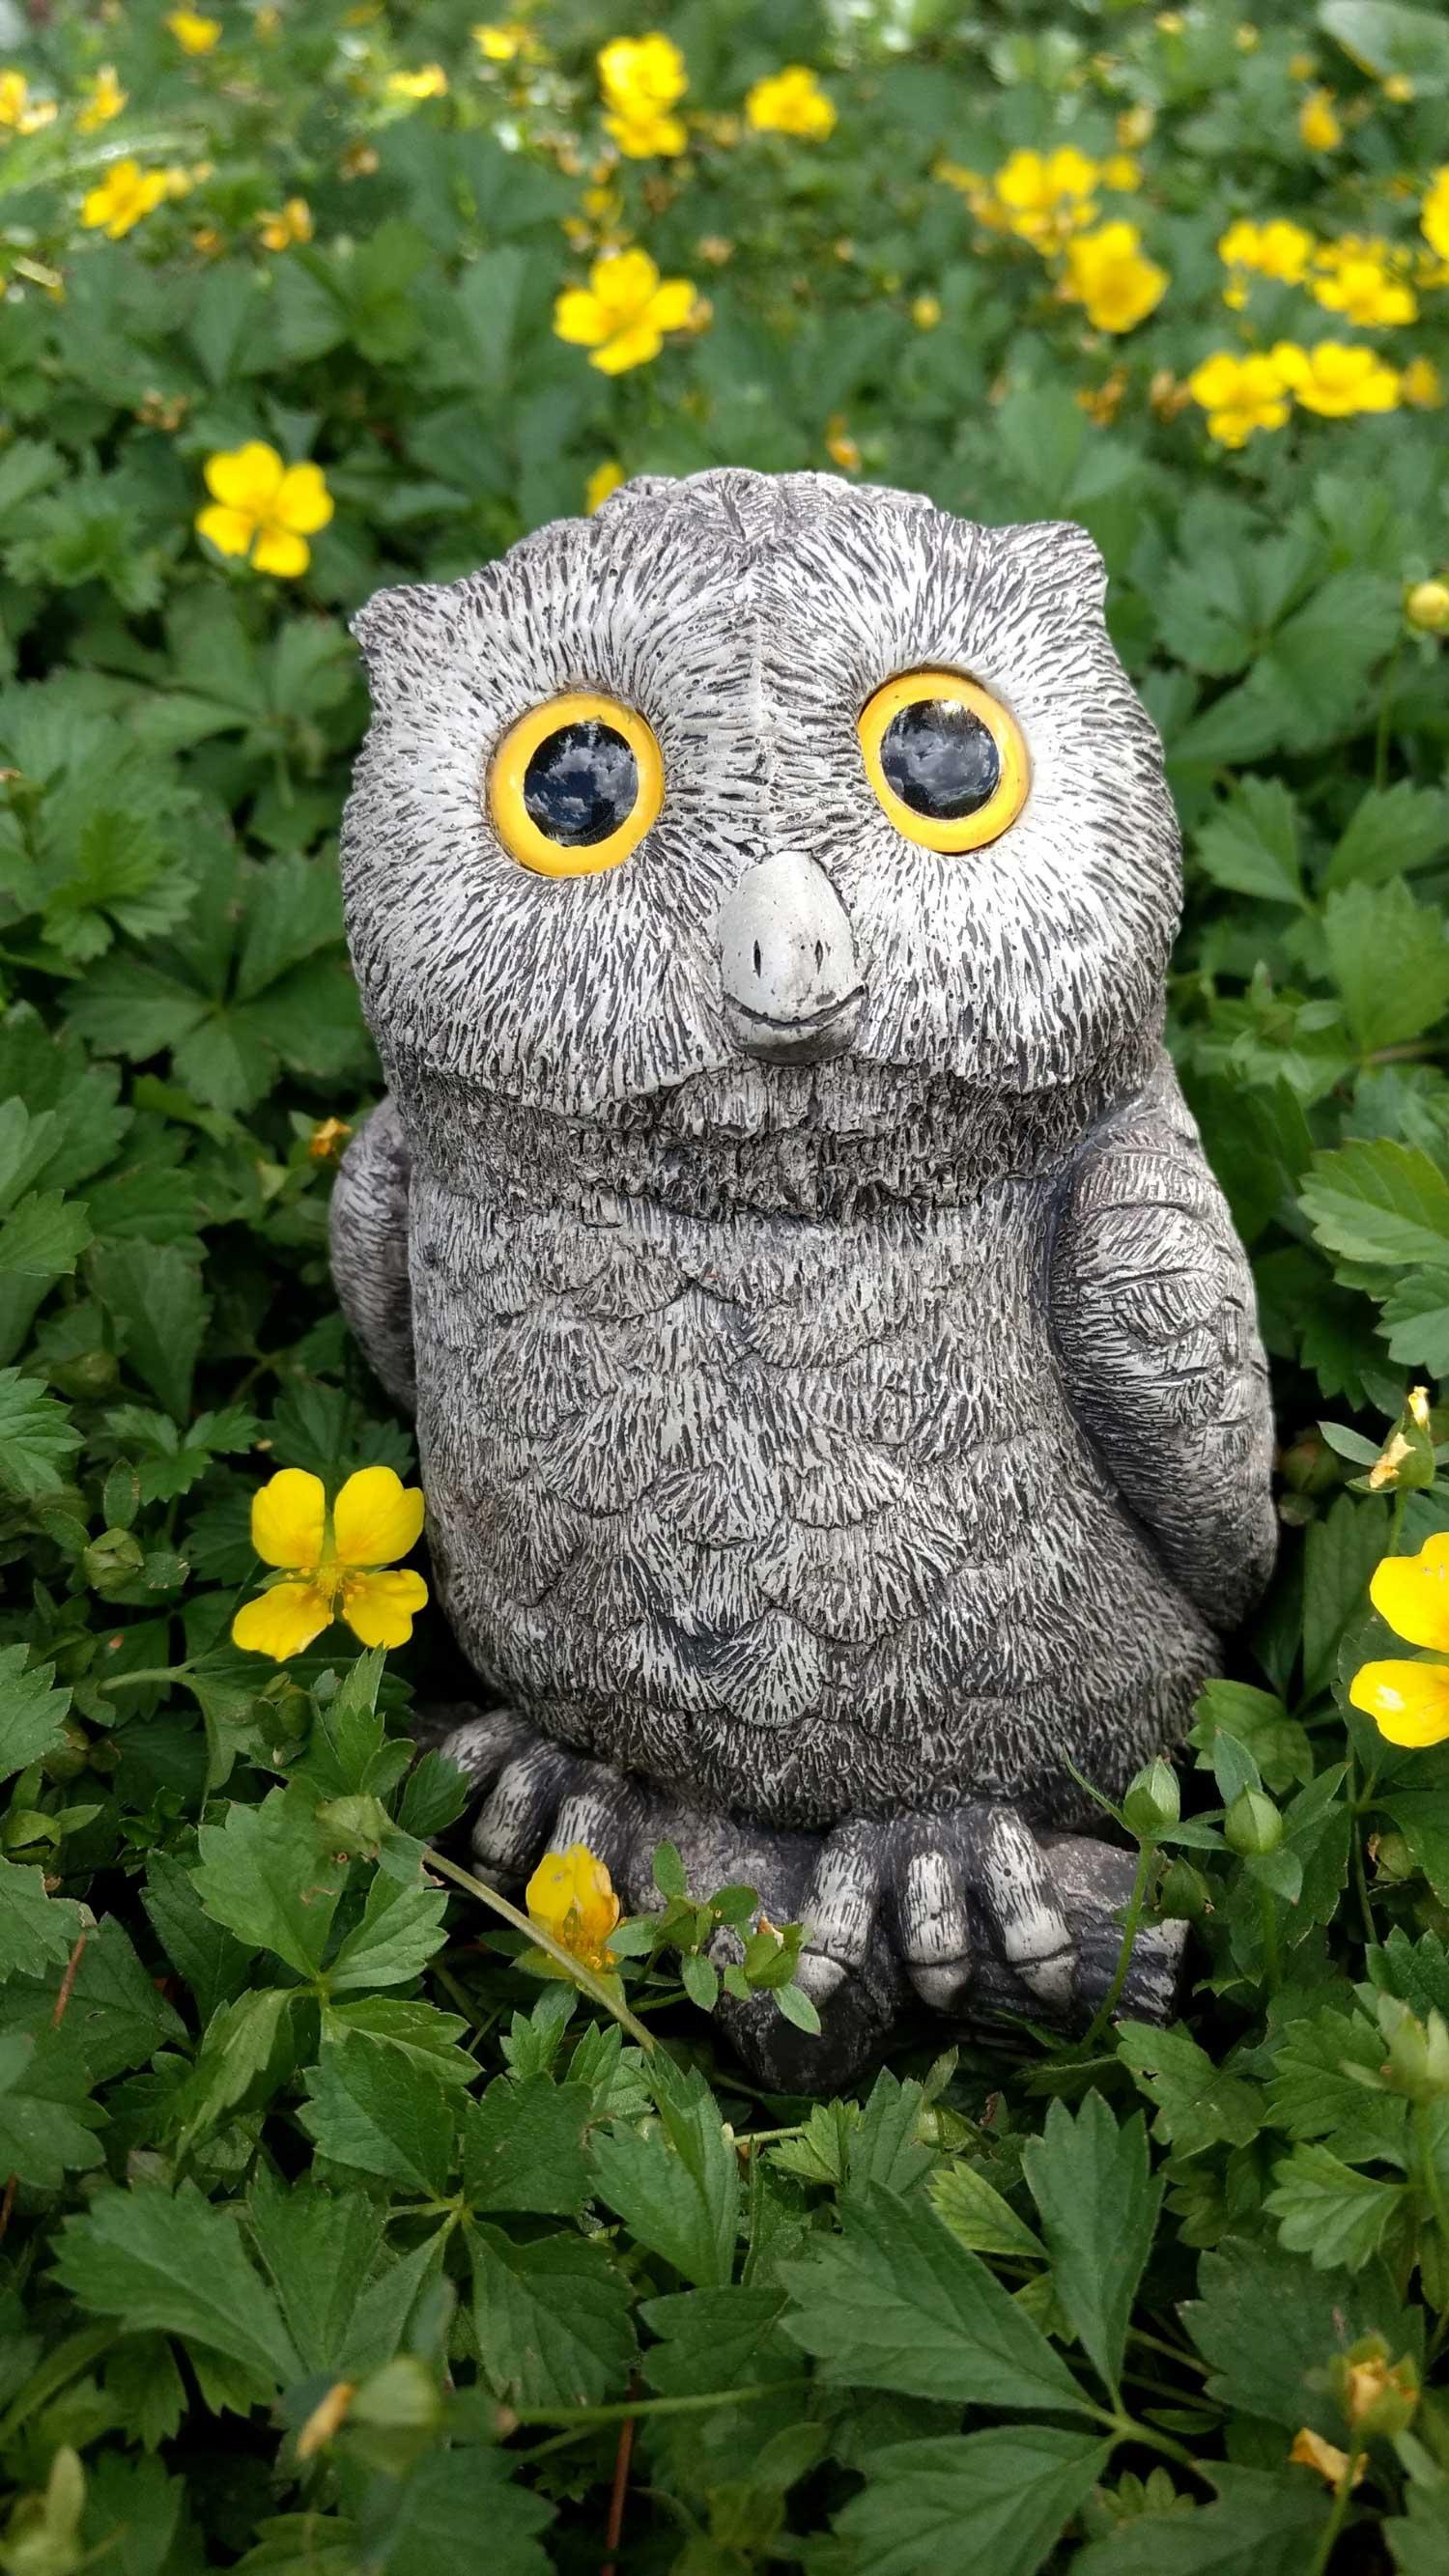 owl-yellow-flowers-14.jpg